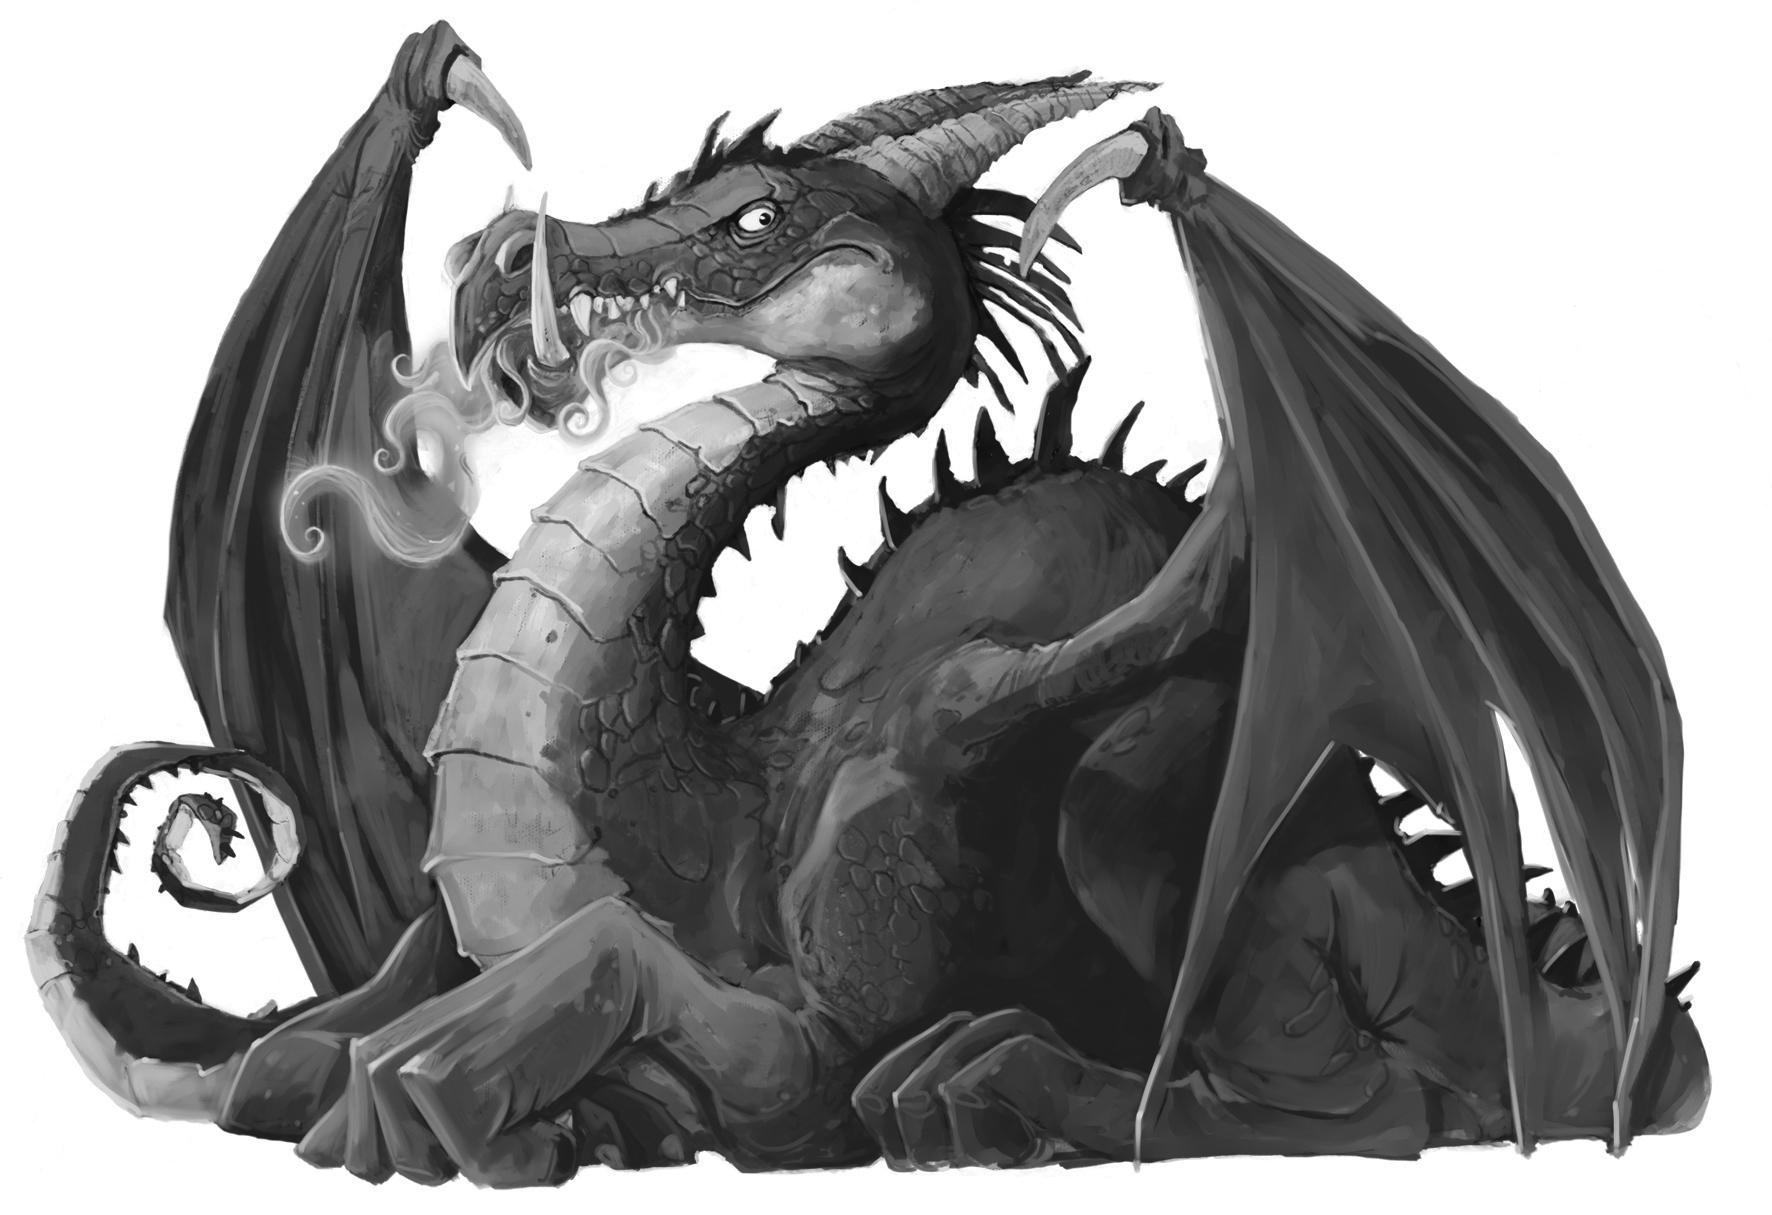 Cool white dragons